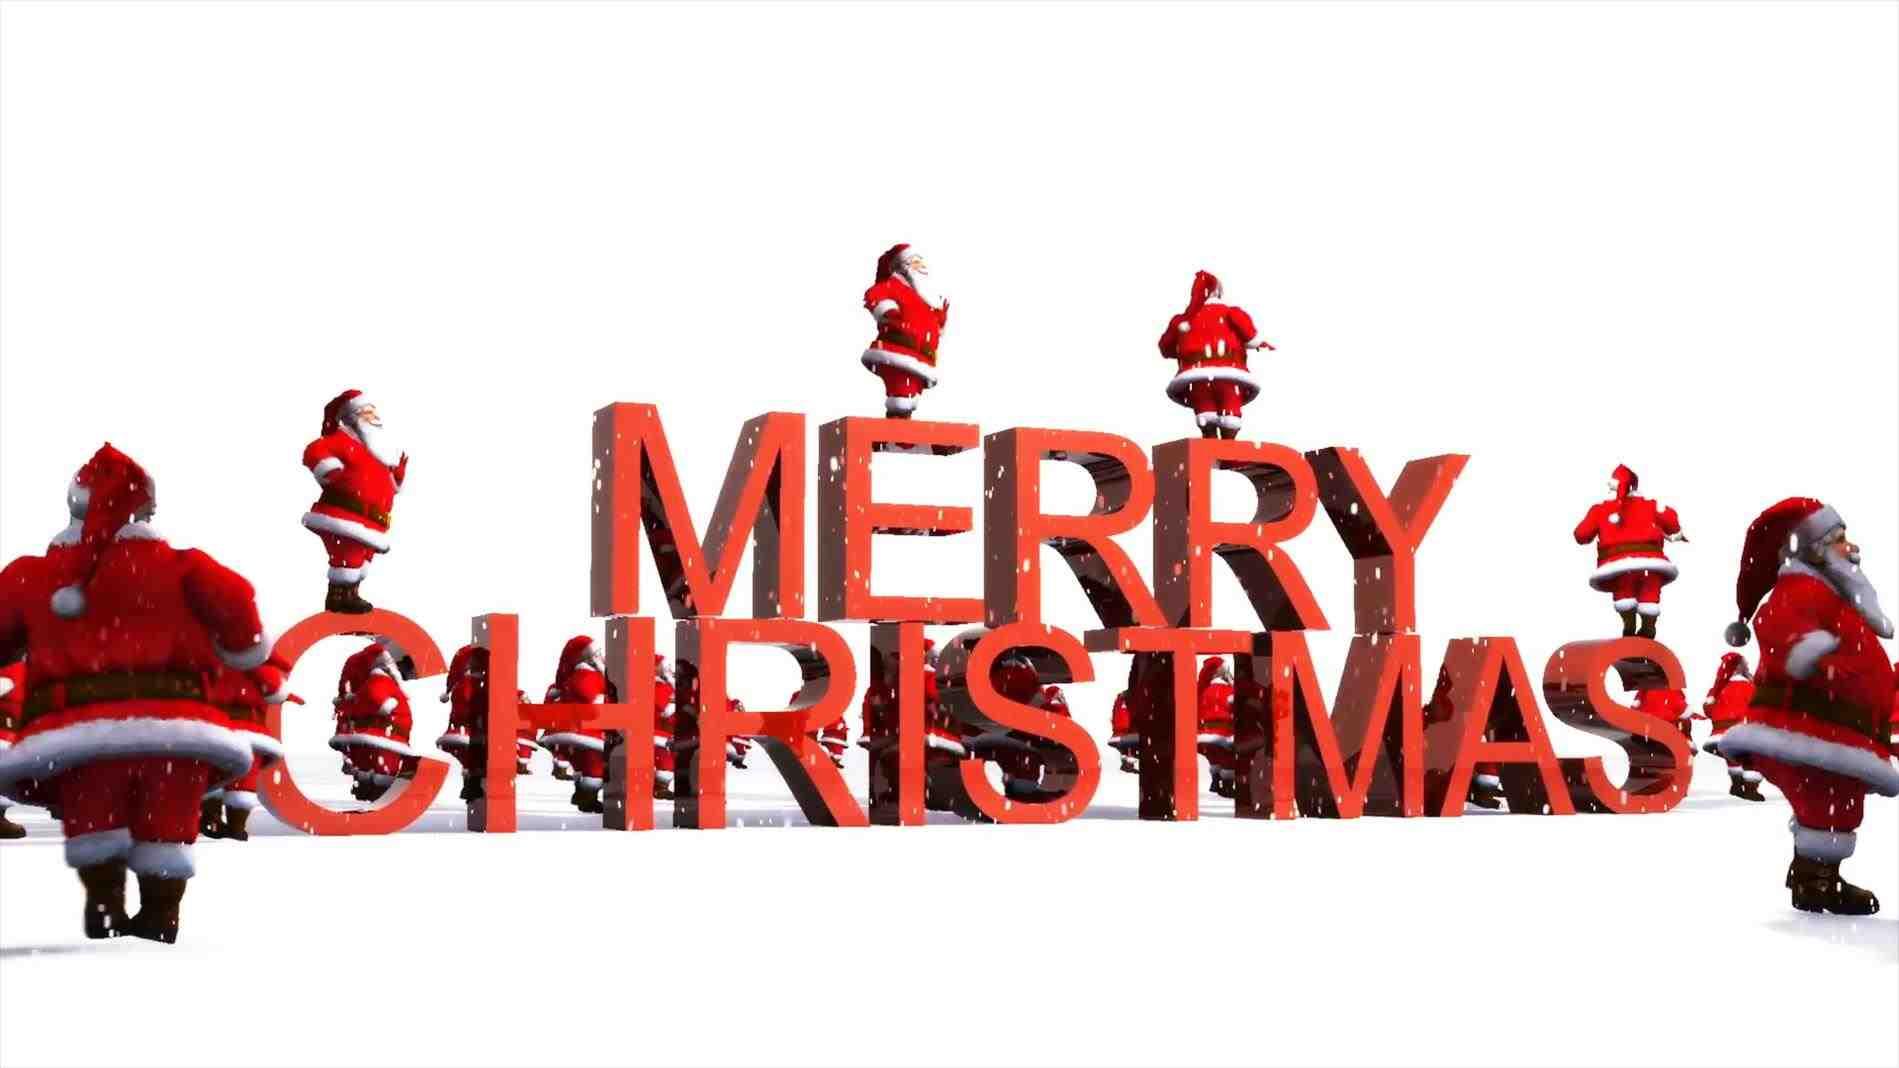 1899x1068 Merry Christmas Text Cheminee.website